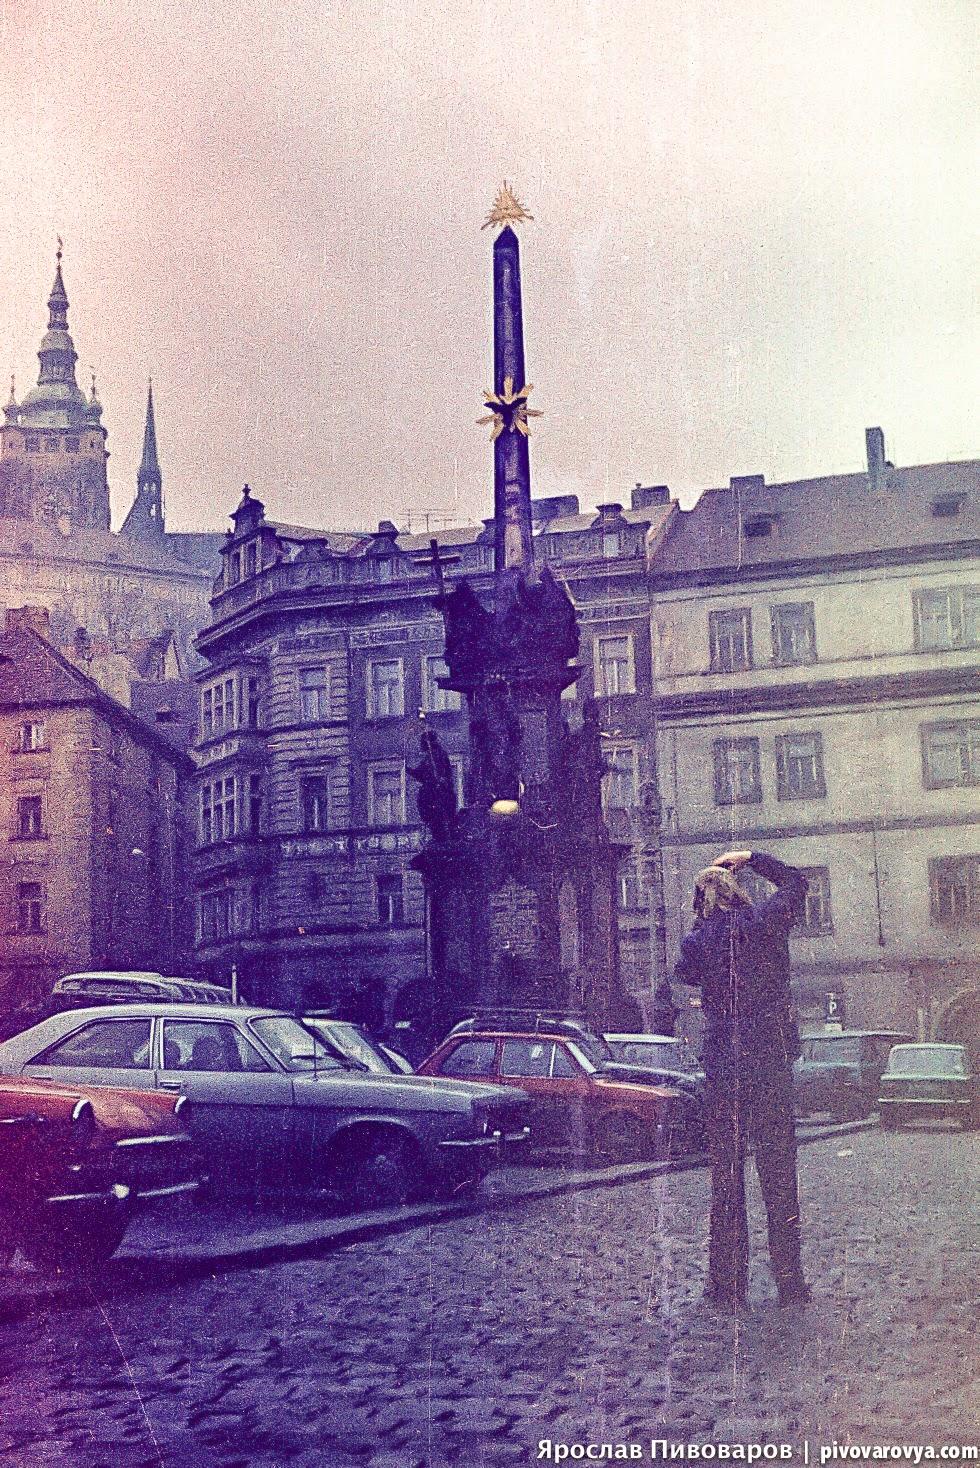 Praha, Morový sloup, 1980